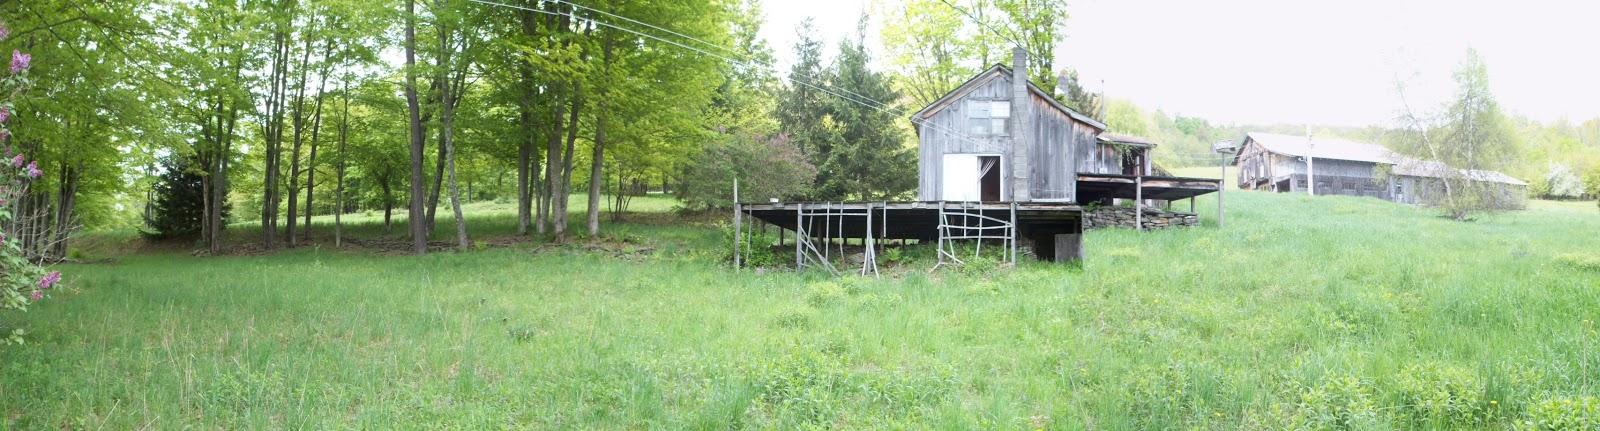 A Cabin In The Catskills